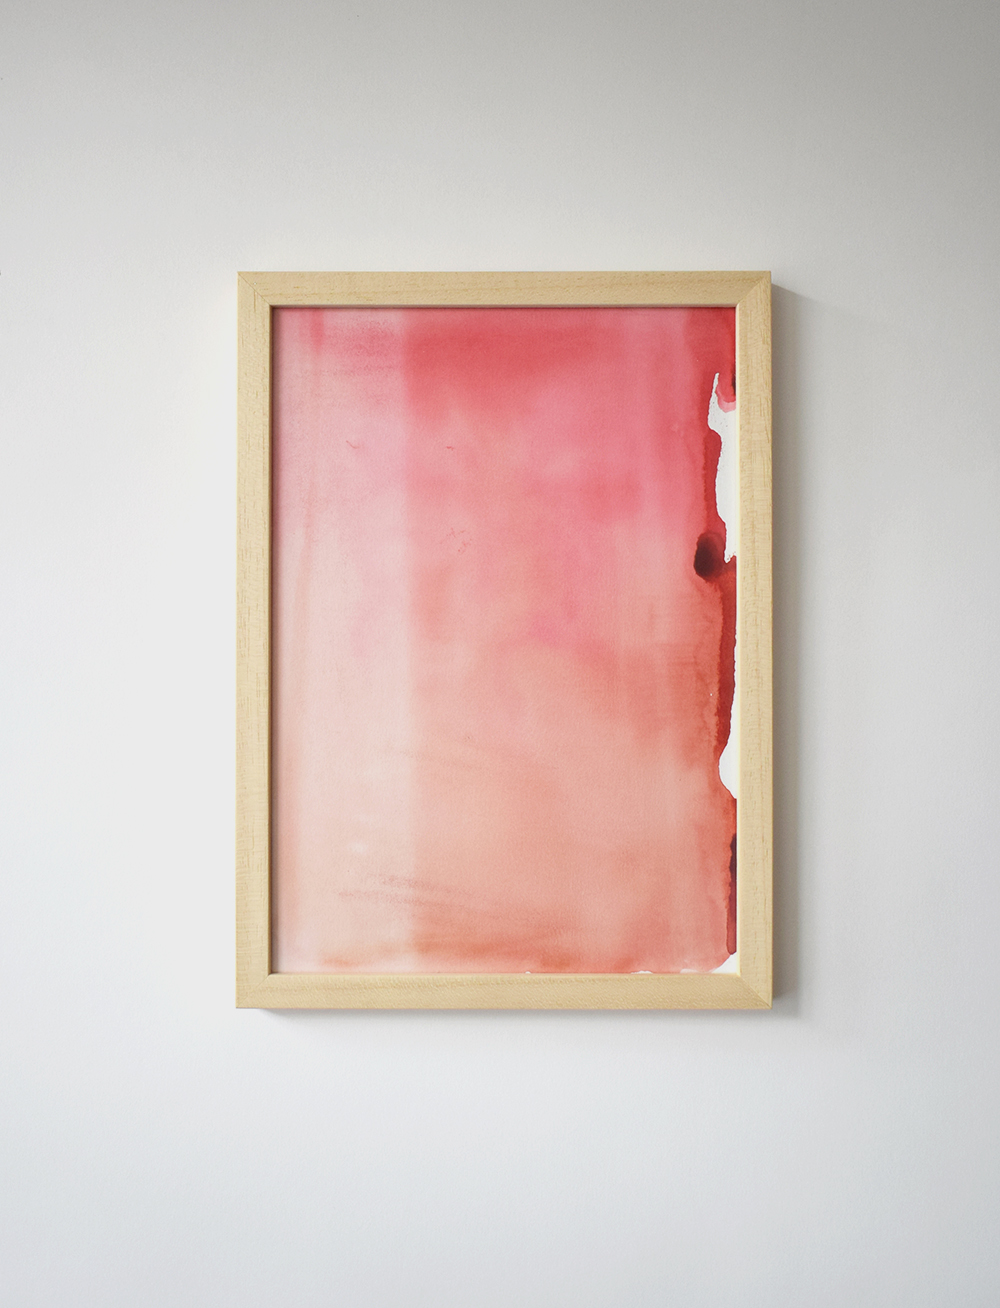 Studio Schipper - Janina Schipper - Monoprint 005 Carmine & Burnt Sienna A4.jpg